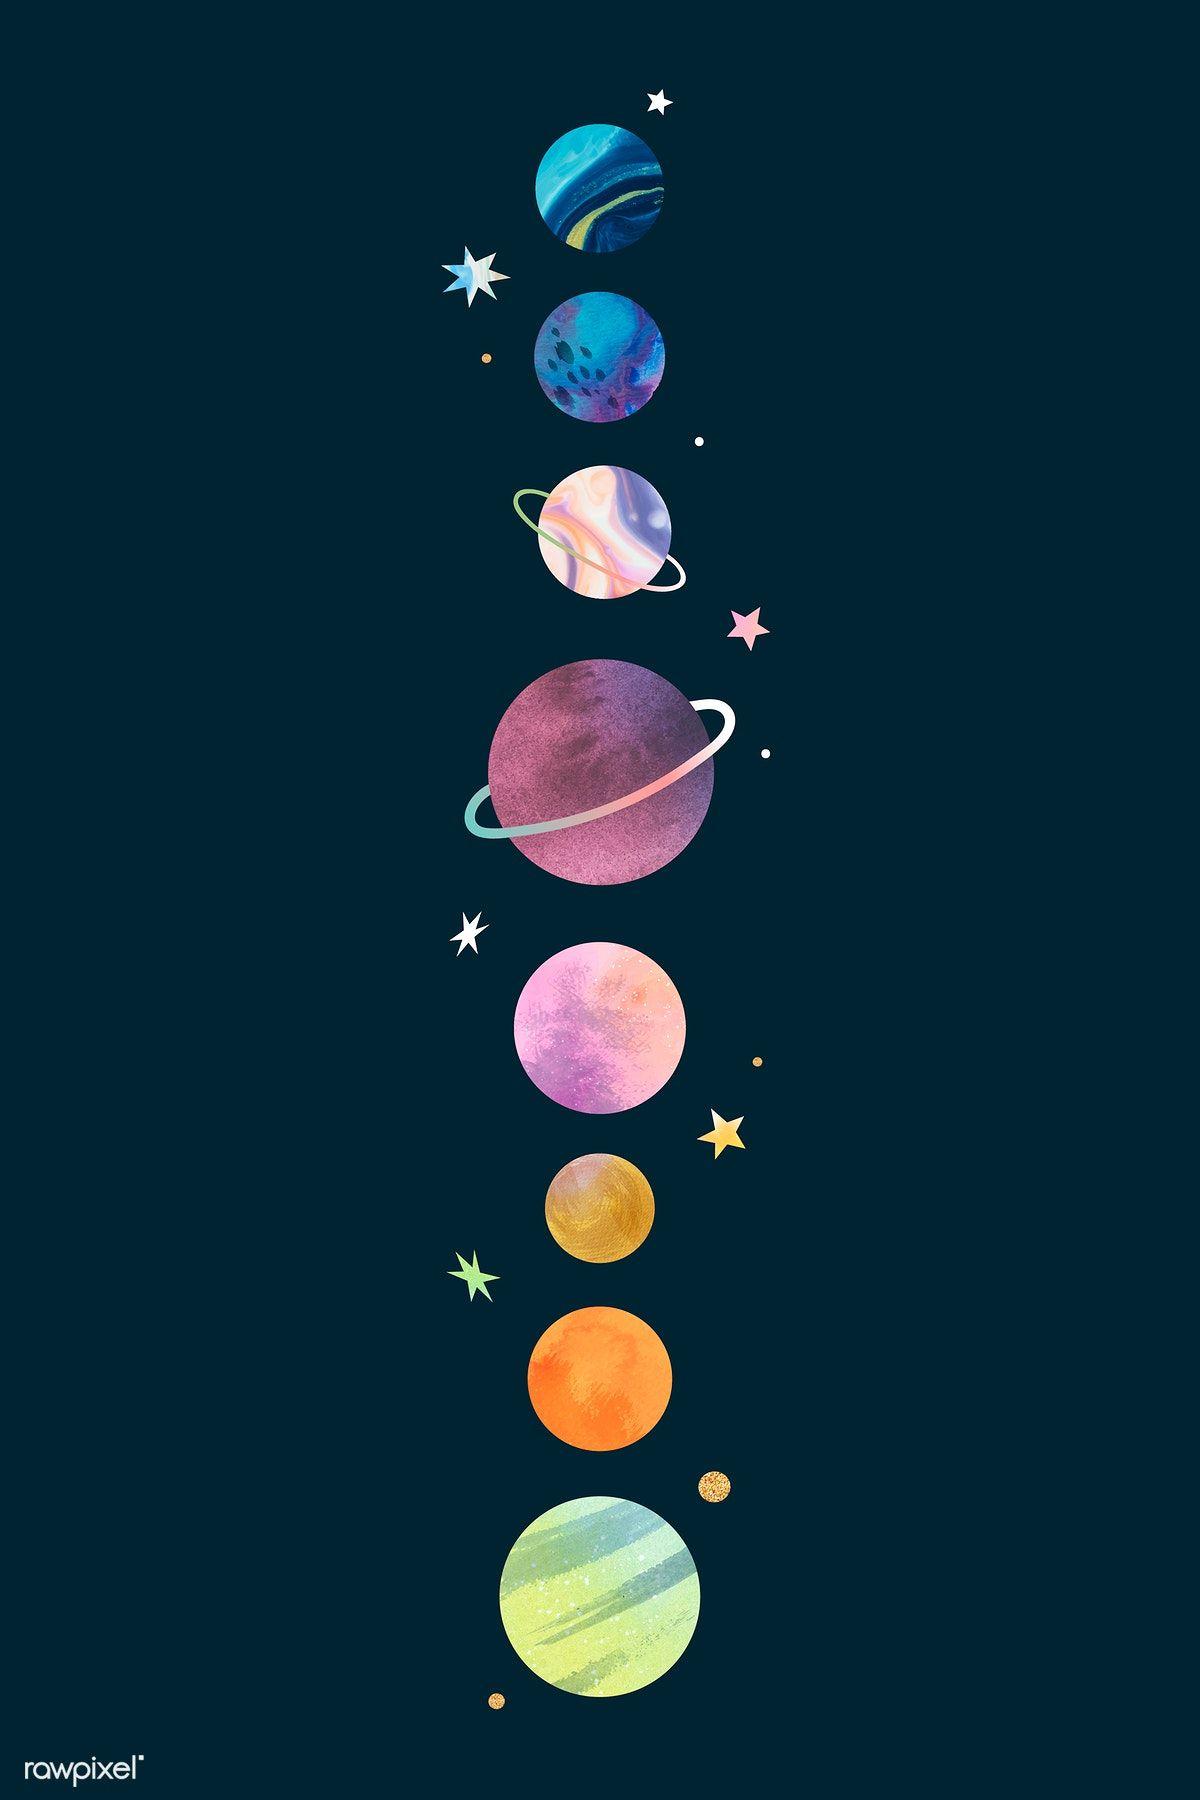 Download premium vector of Colorful galaxy watercolor doodle on black